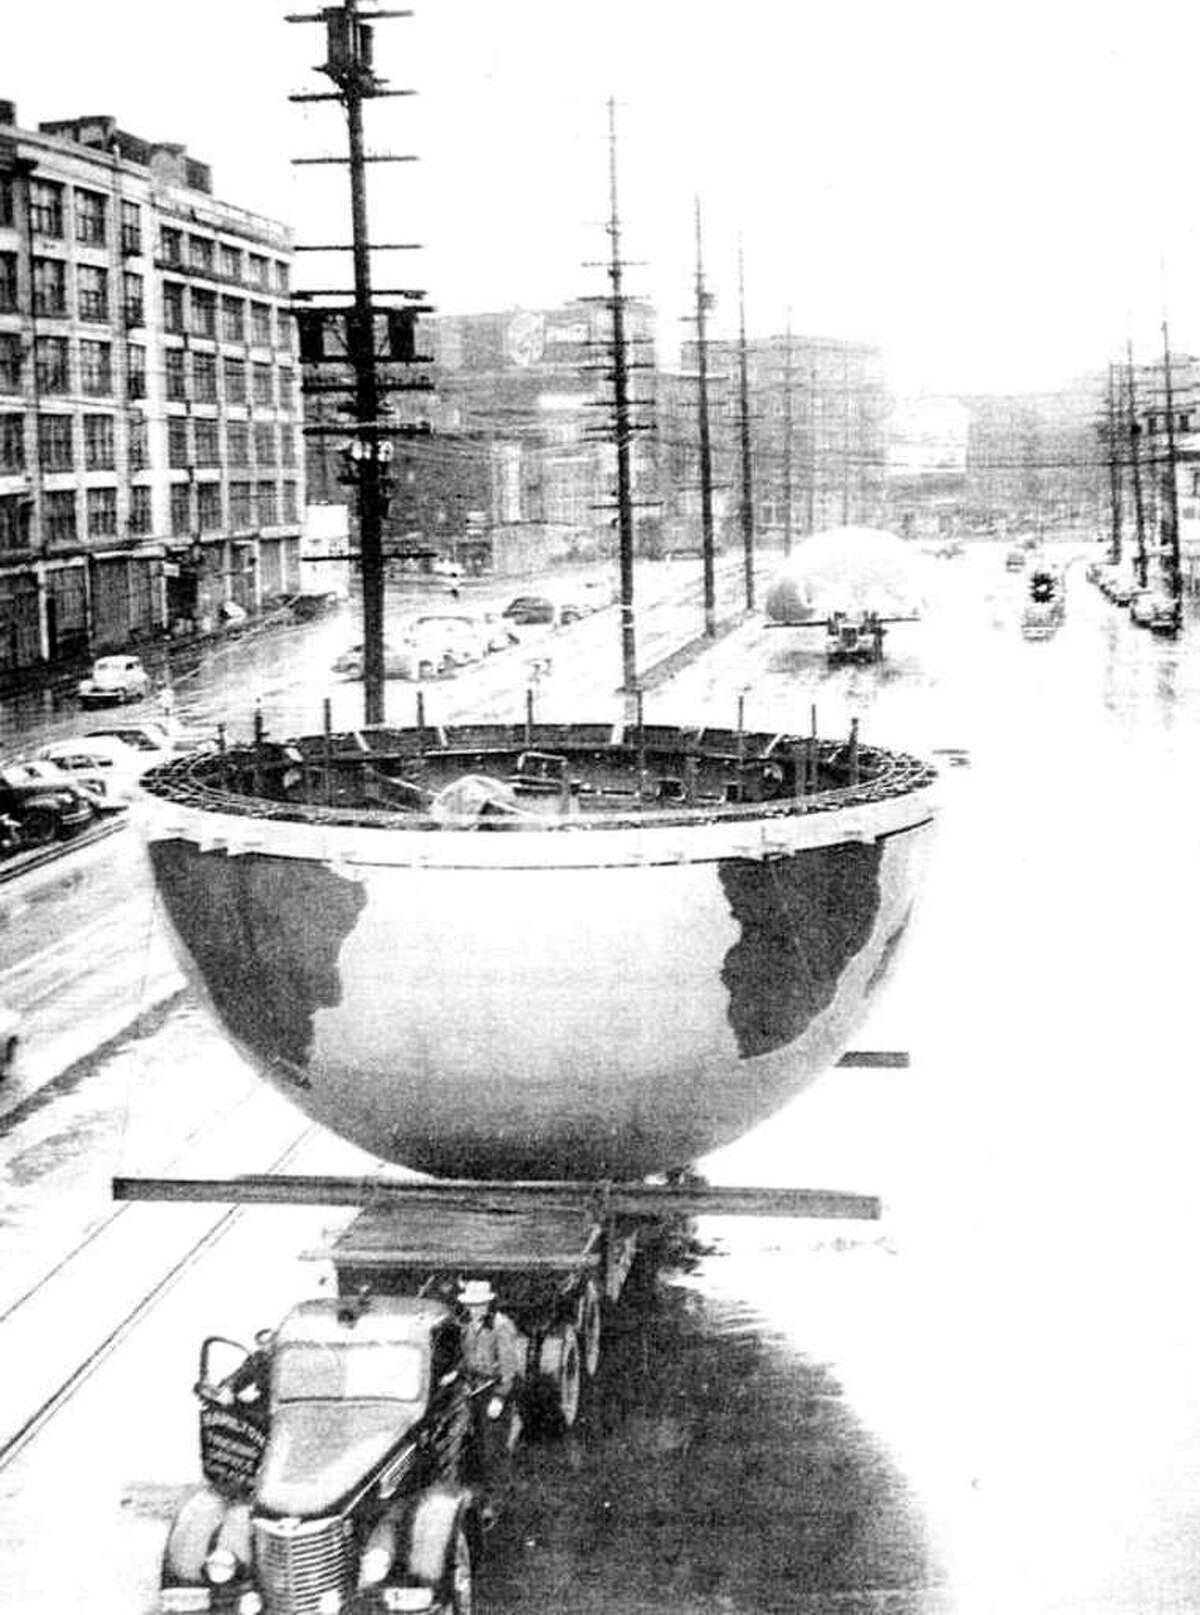 The globe on Alaskan Way, Nov. 1948.